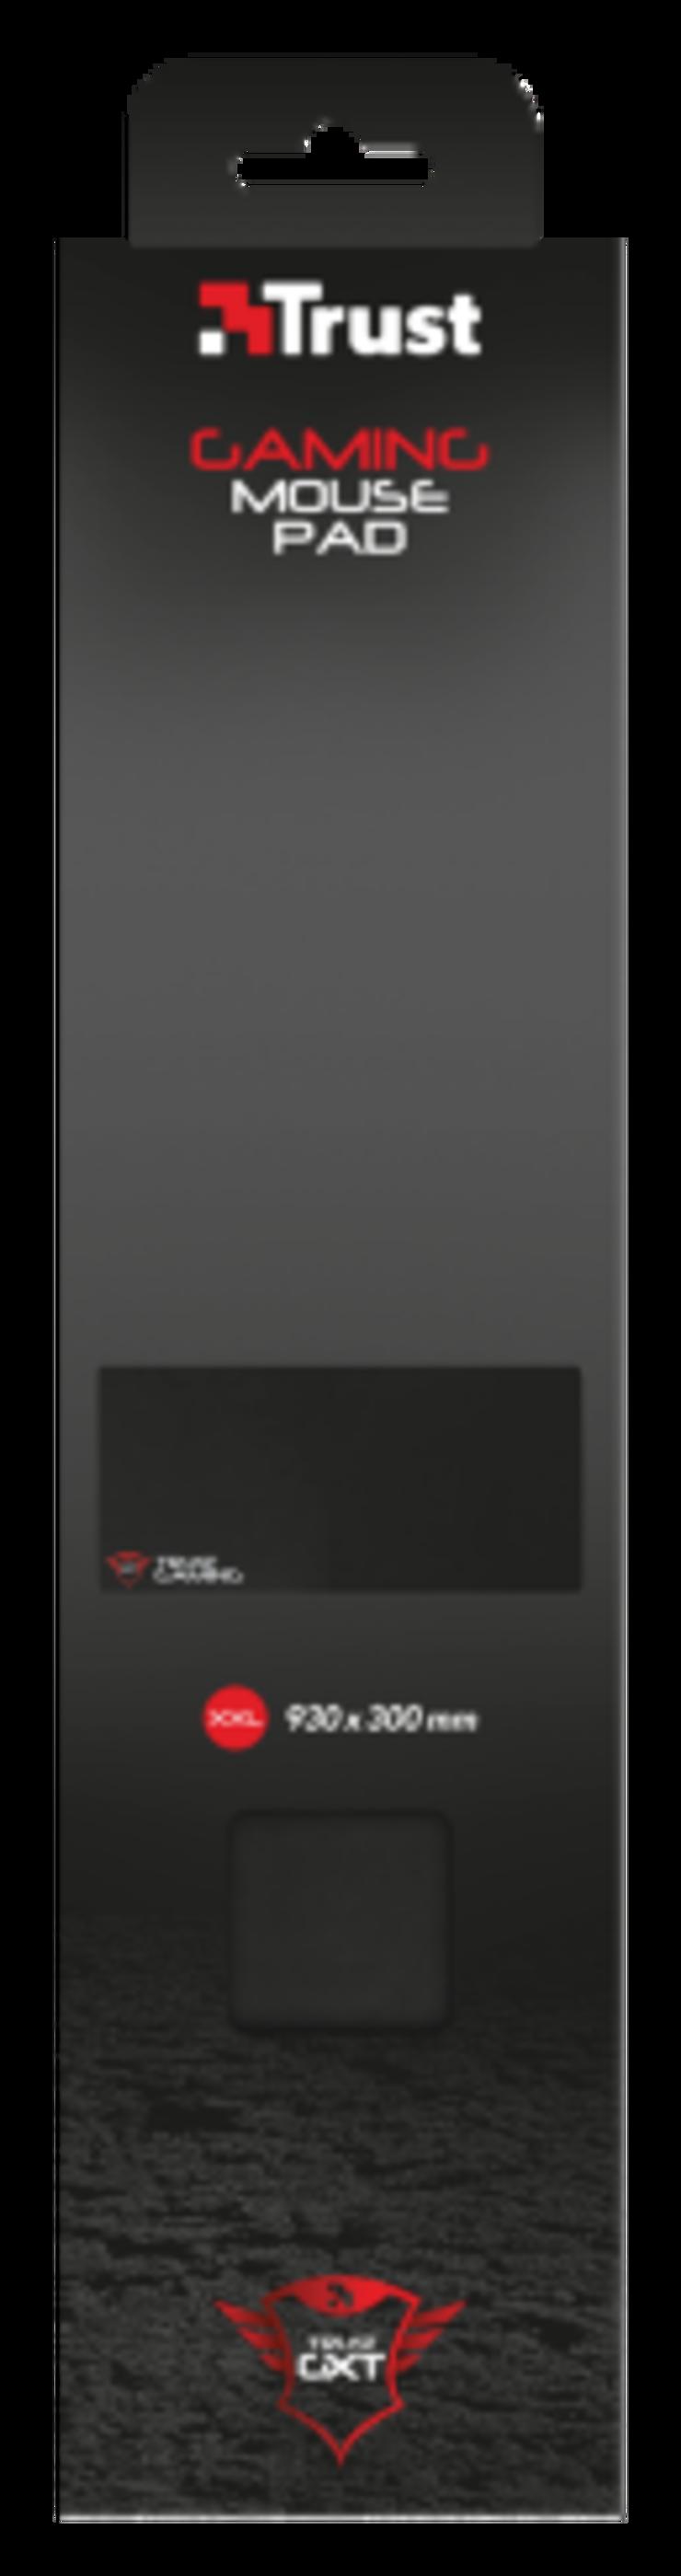 TAPIS SOURIS GAMING GXT 758 XXL DIM 930x300 mm tr21569-5